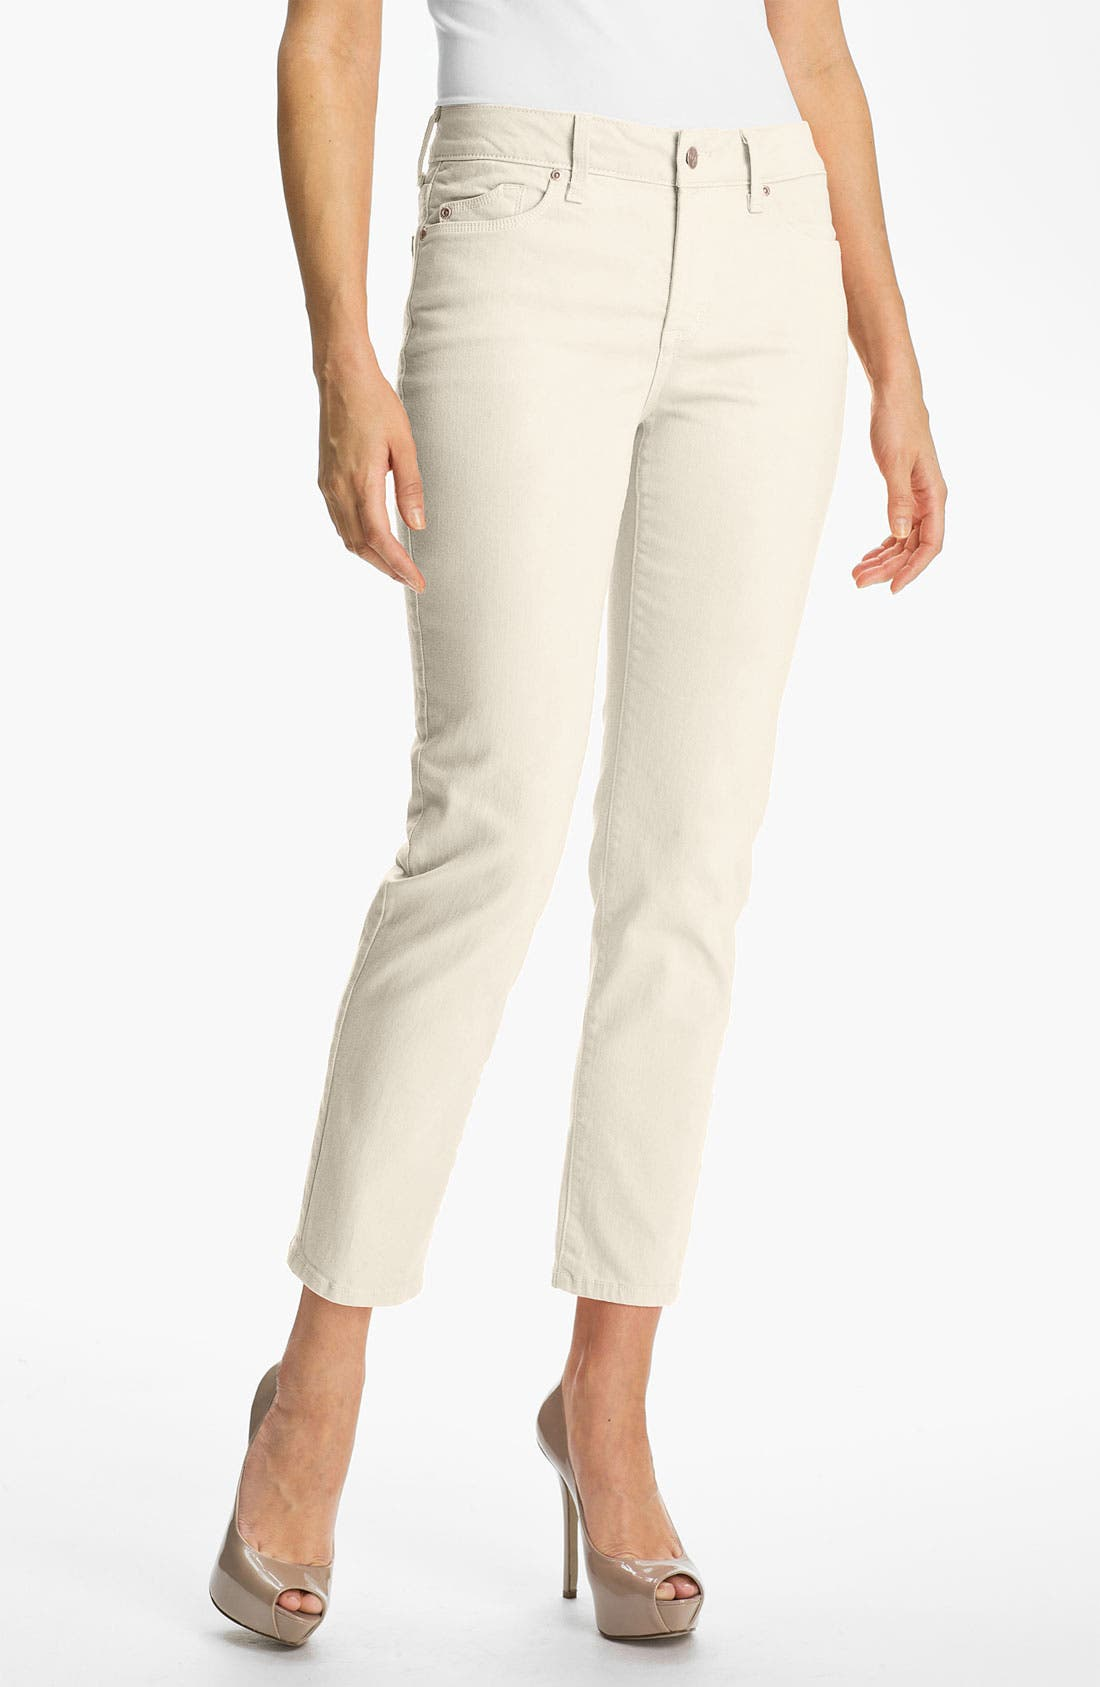 Main Image - NYDJ 'Alisha' Skinny Stretch Ankle Jeans (Regular & Petite)